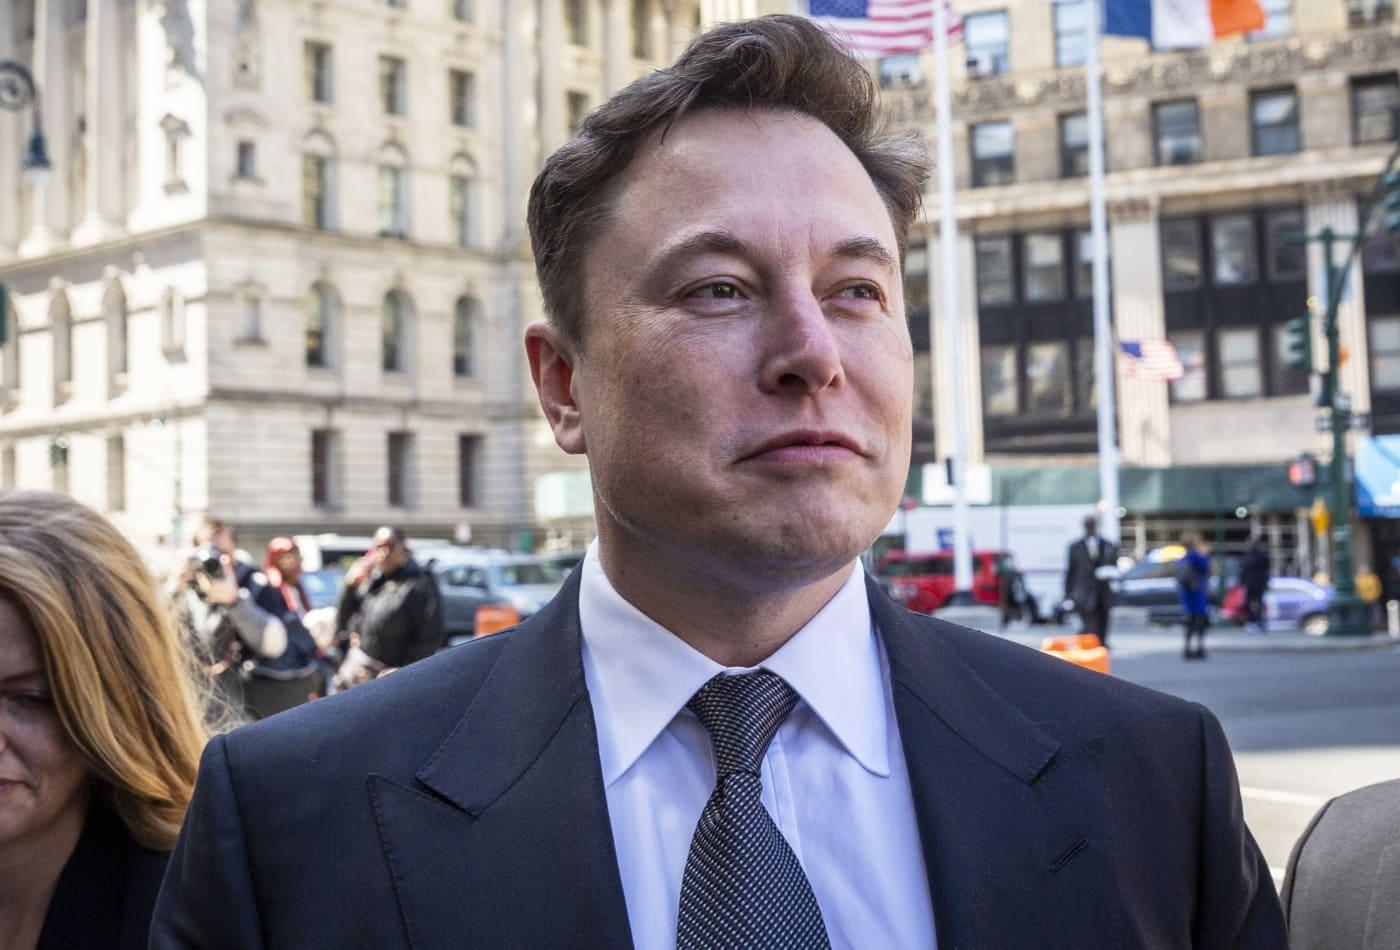 Bridgewater's Ray Dalio had Elon Musk, Bill Gates do personality test